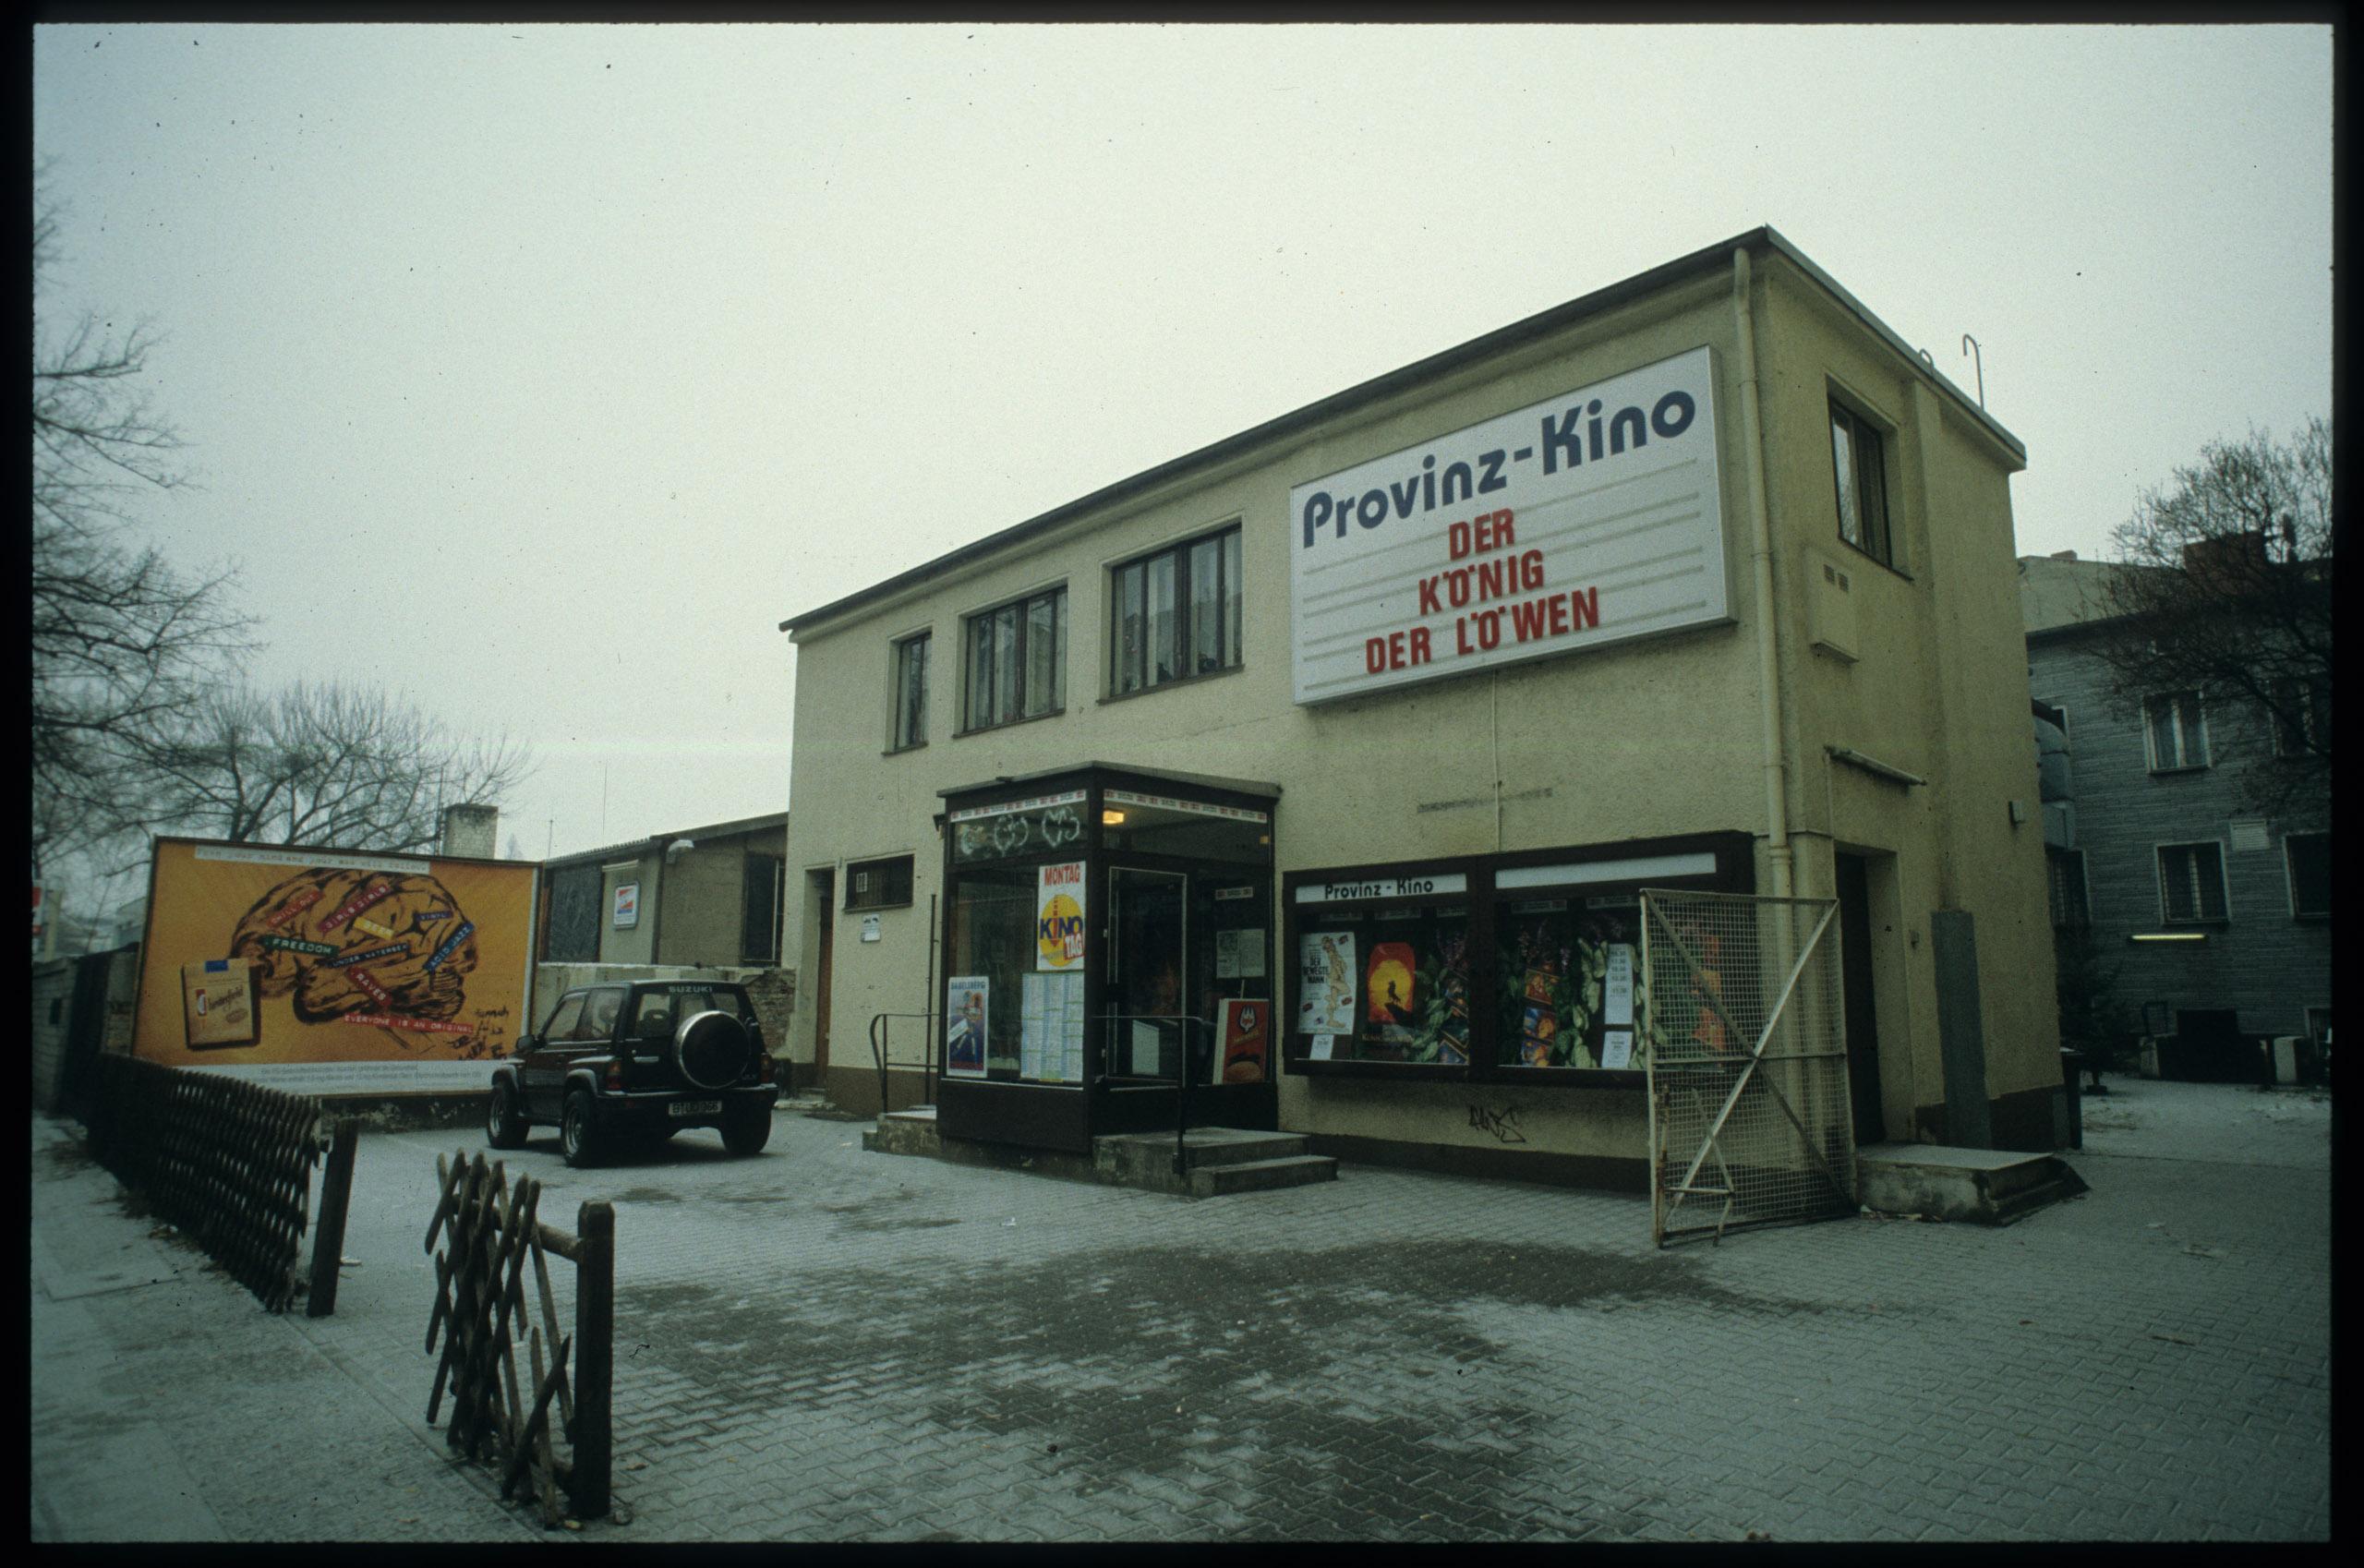 Farbfoto: Eingang mit Kinotafel im Winter